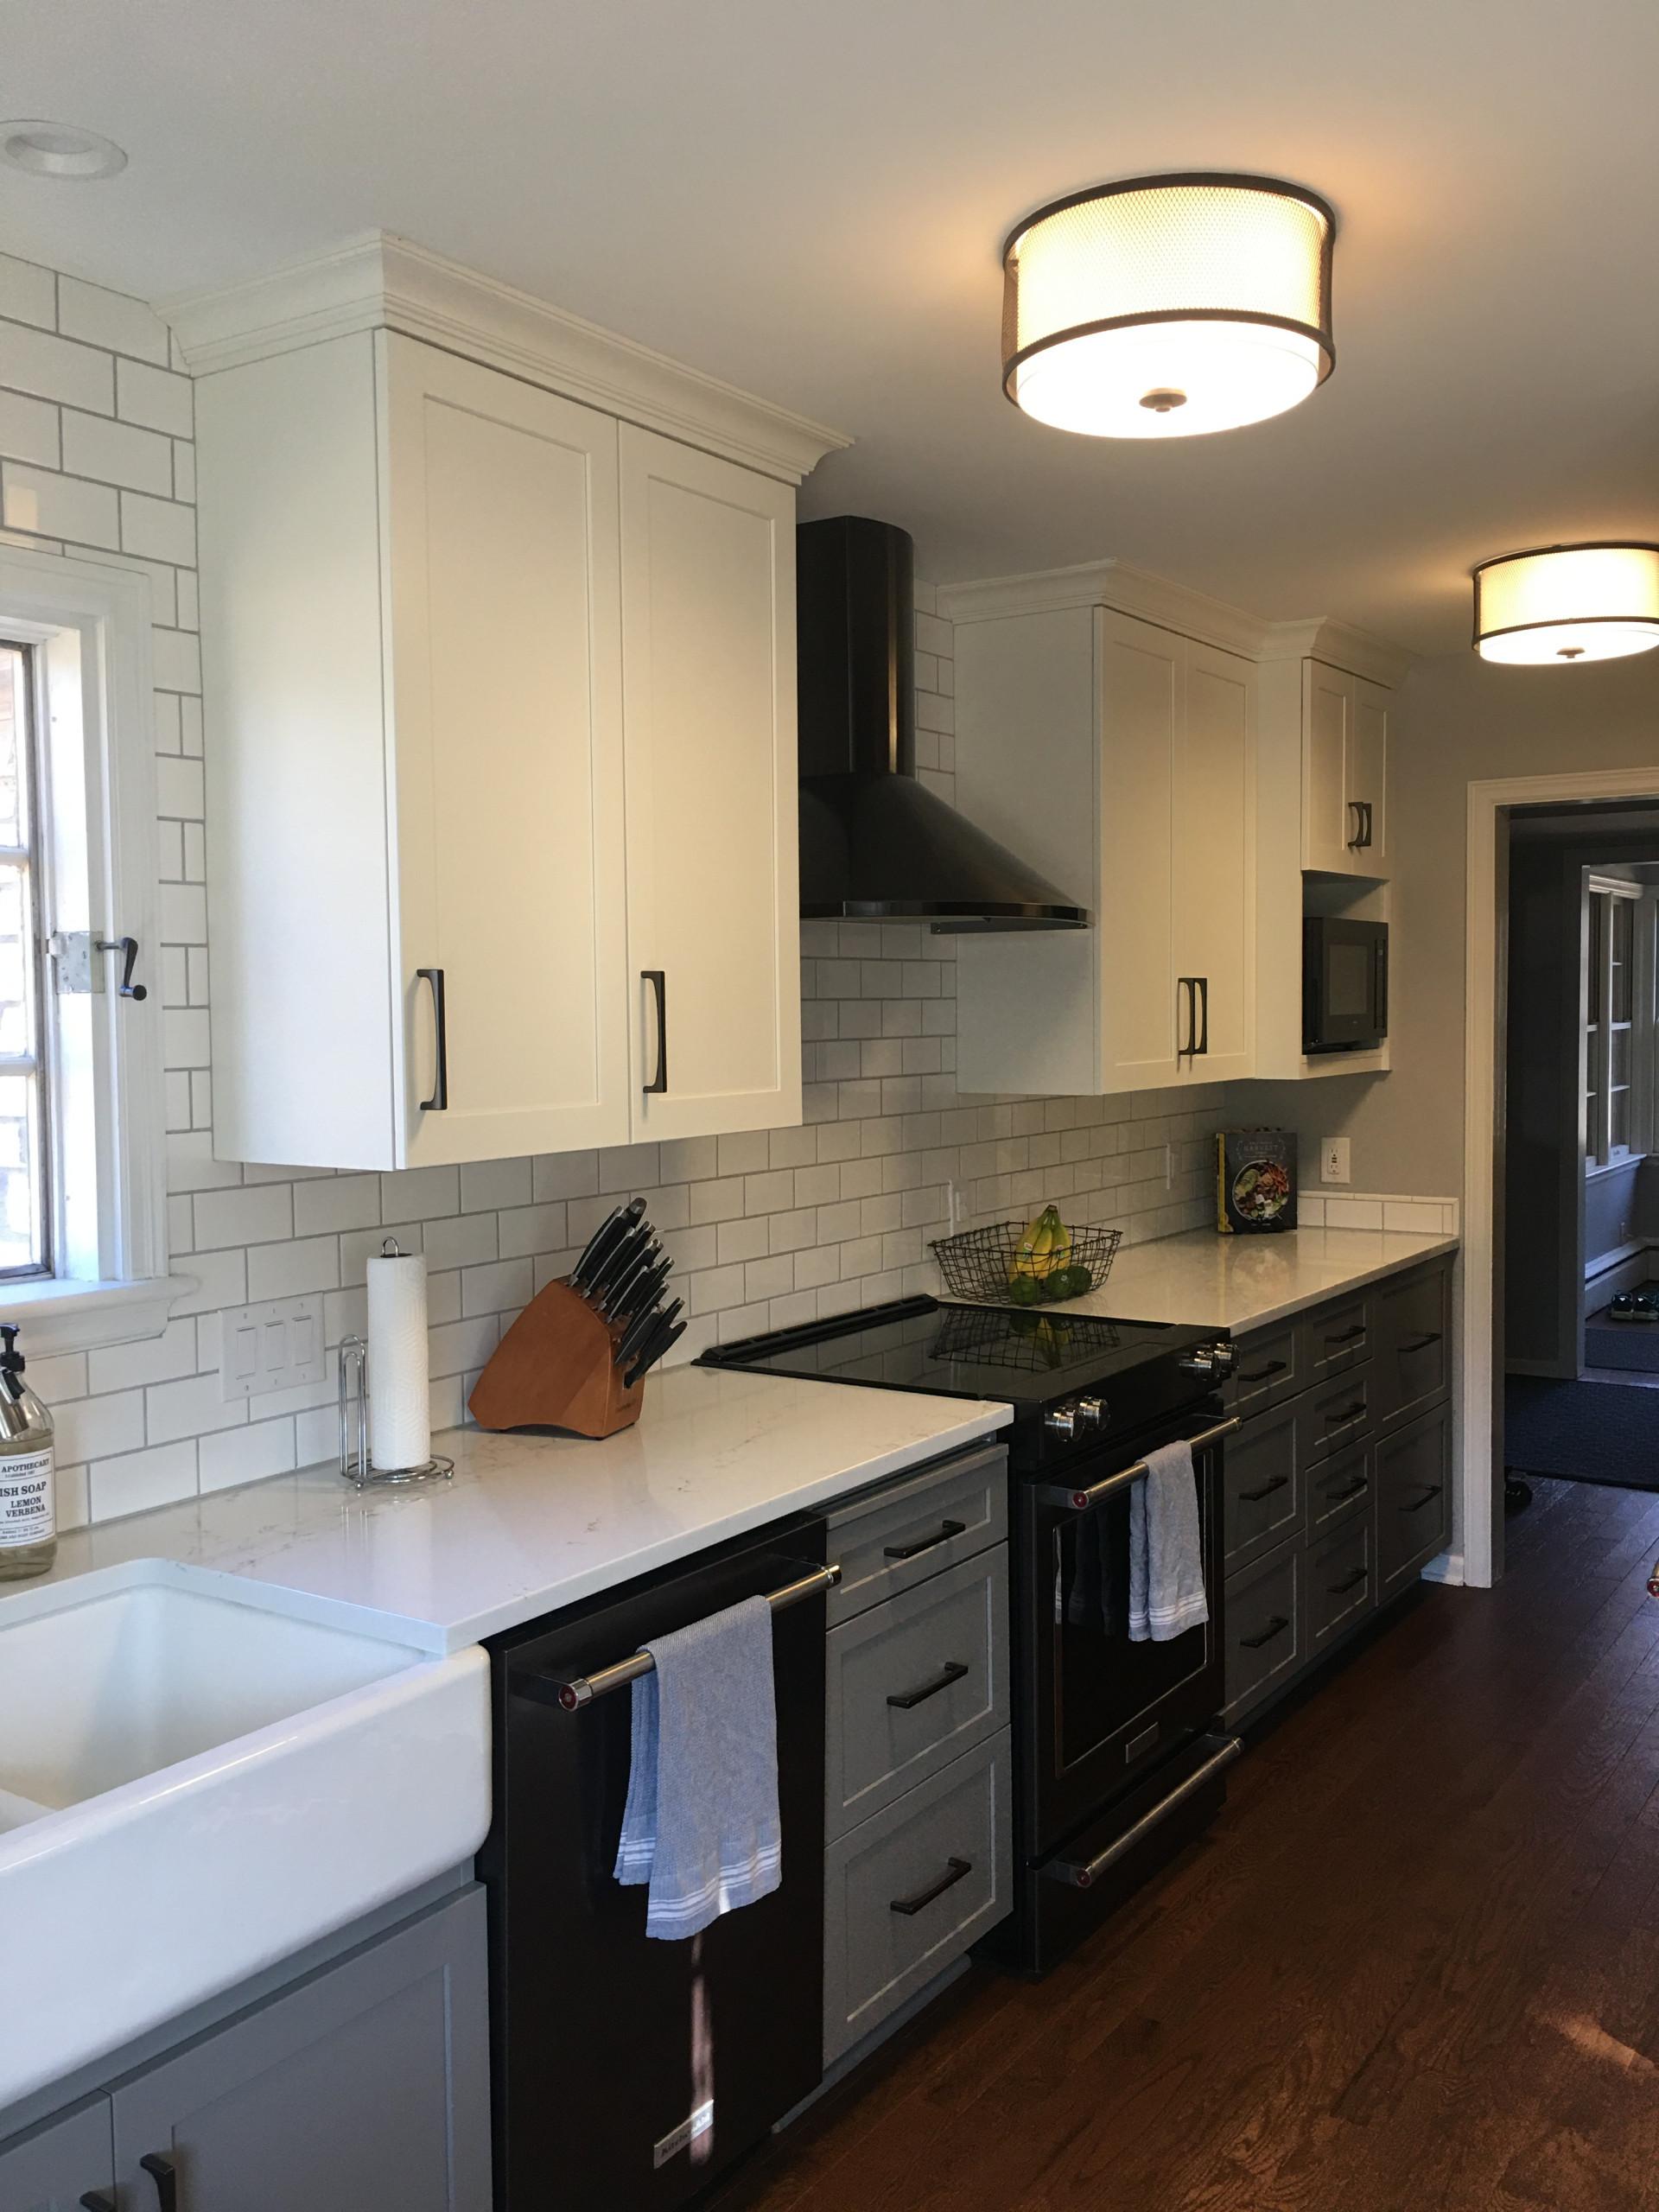 East Pershing Home Renovation